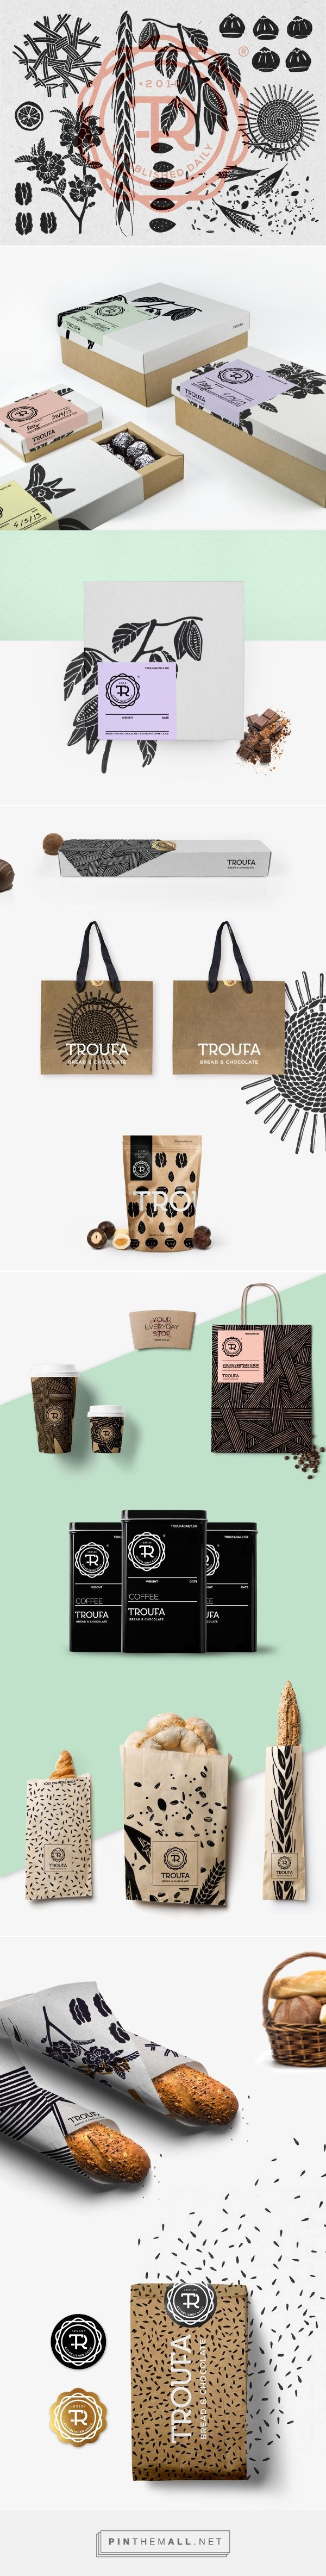 Troufa Branding on Behance | Fivestar Branding – Design and Branding Agency & Inspiration Gallery